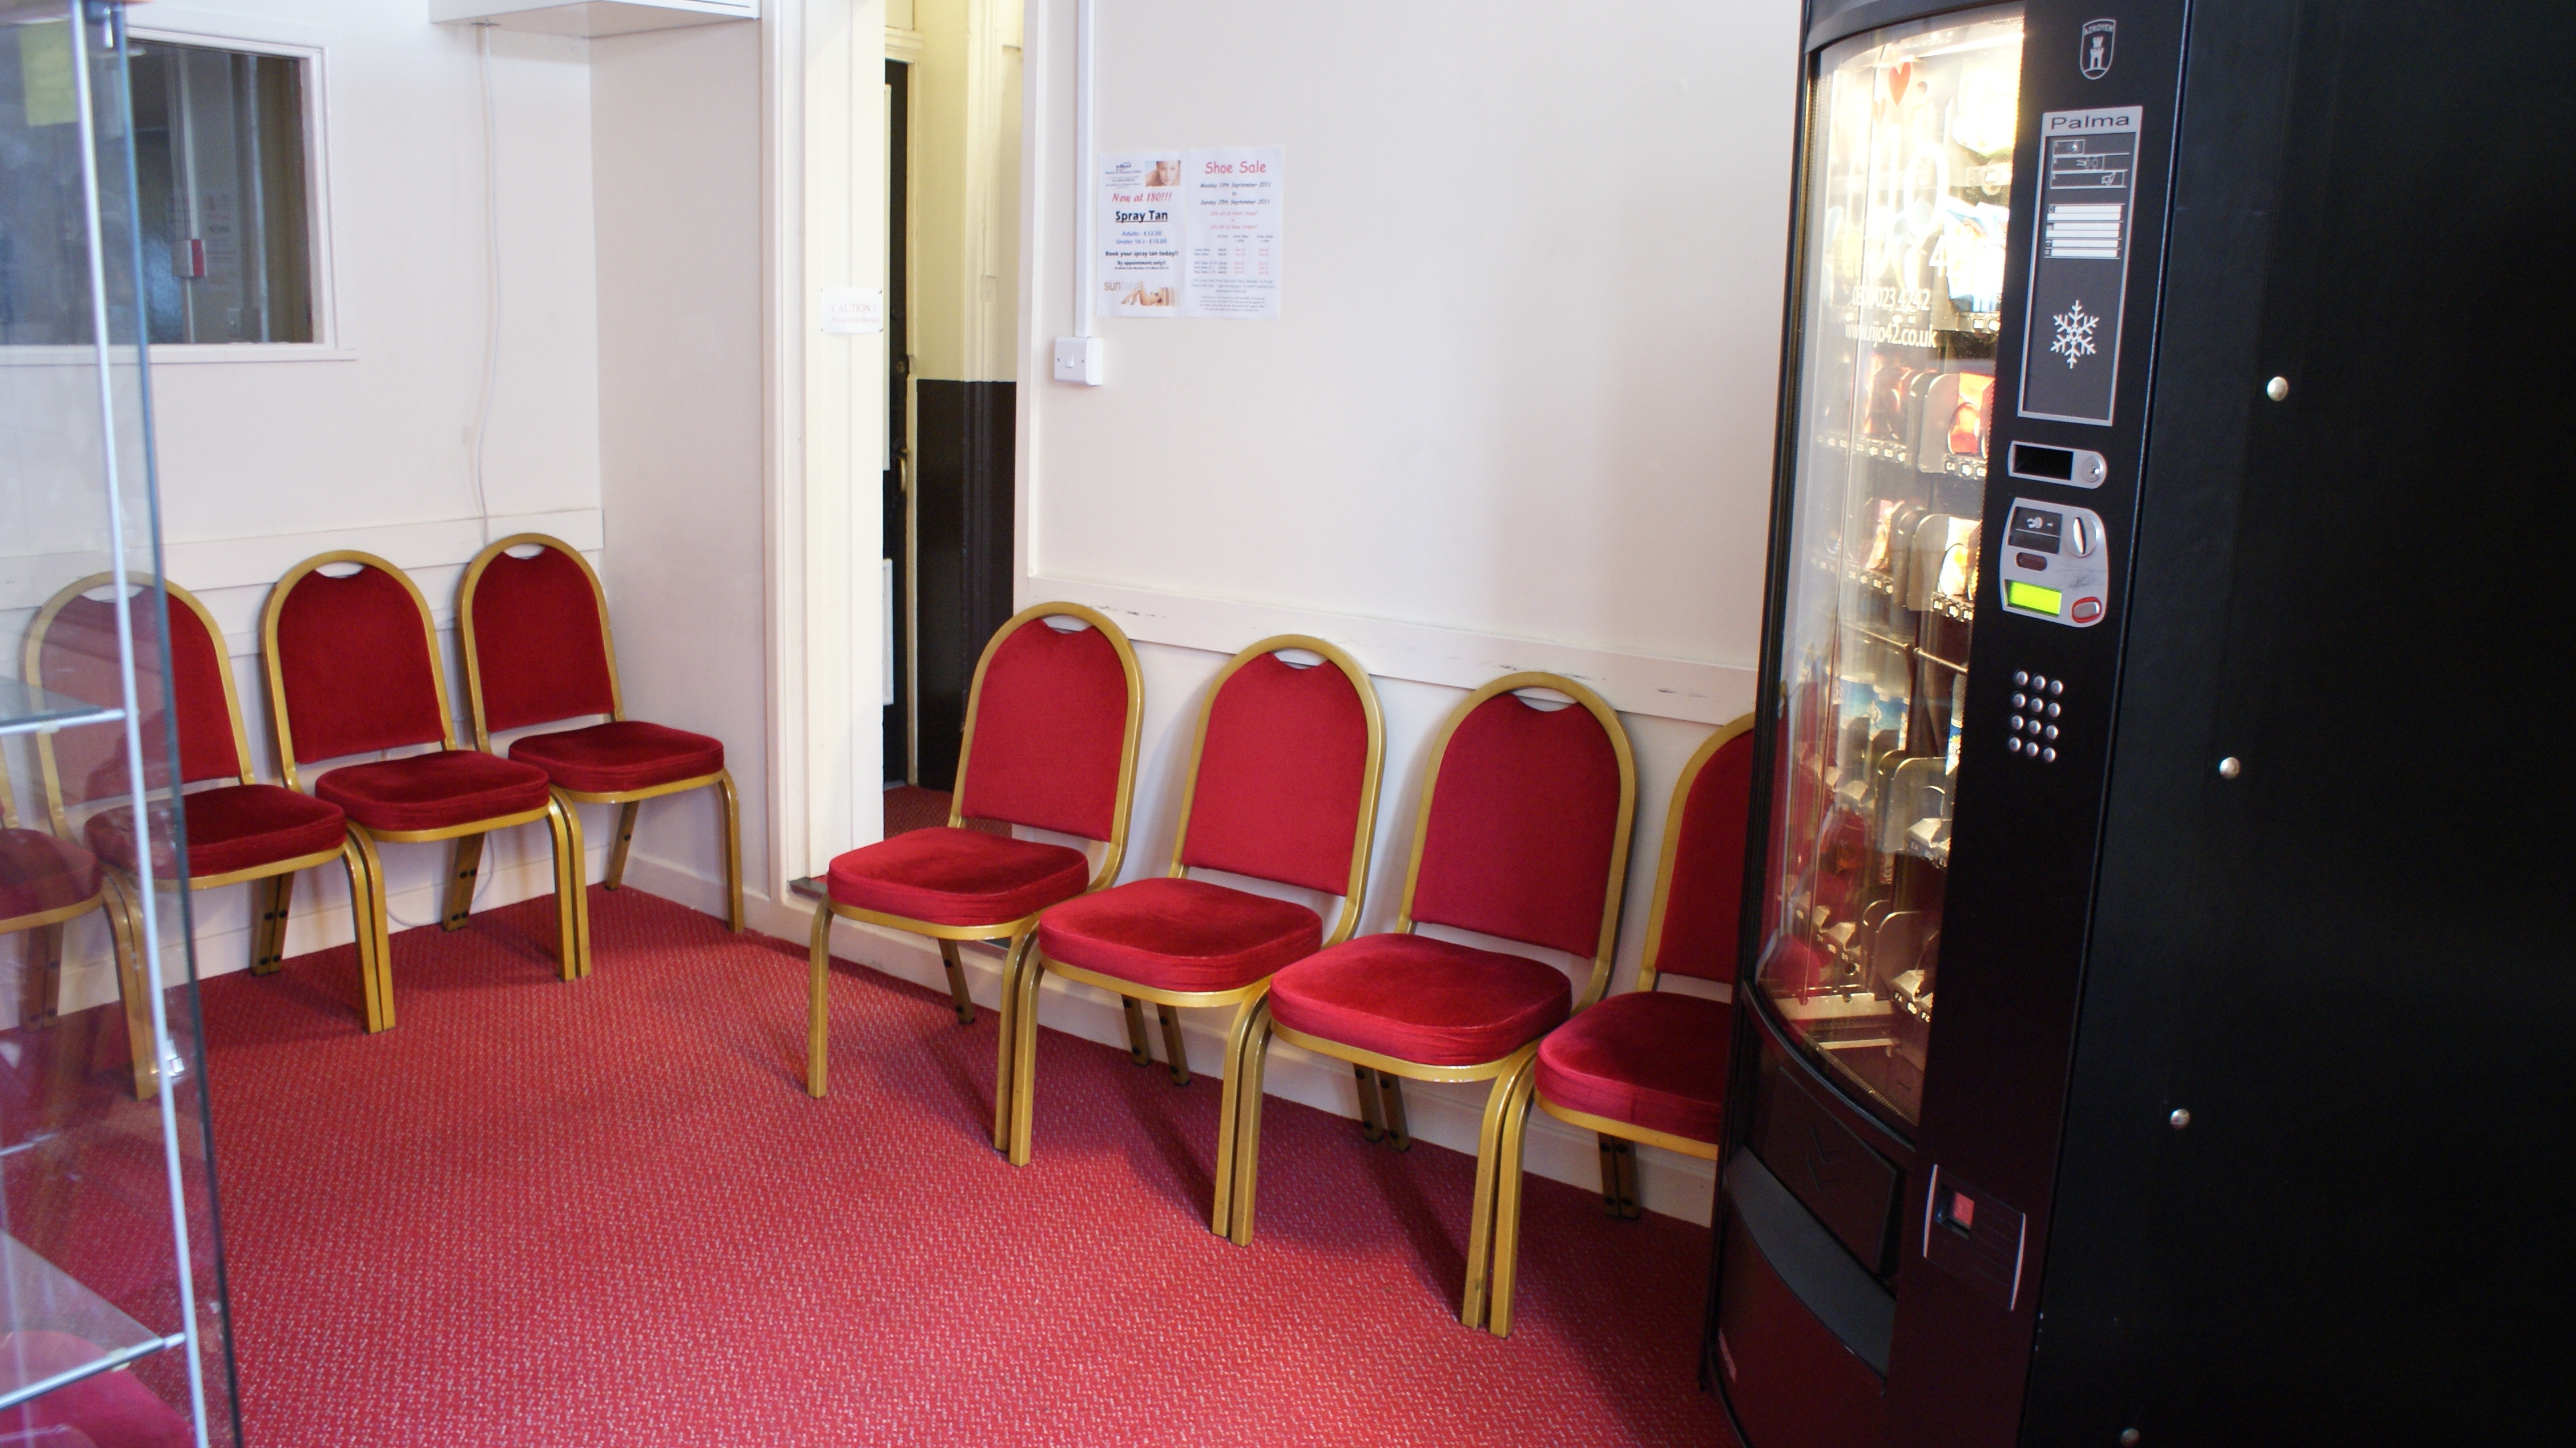 Waiting/Meeting Room